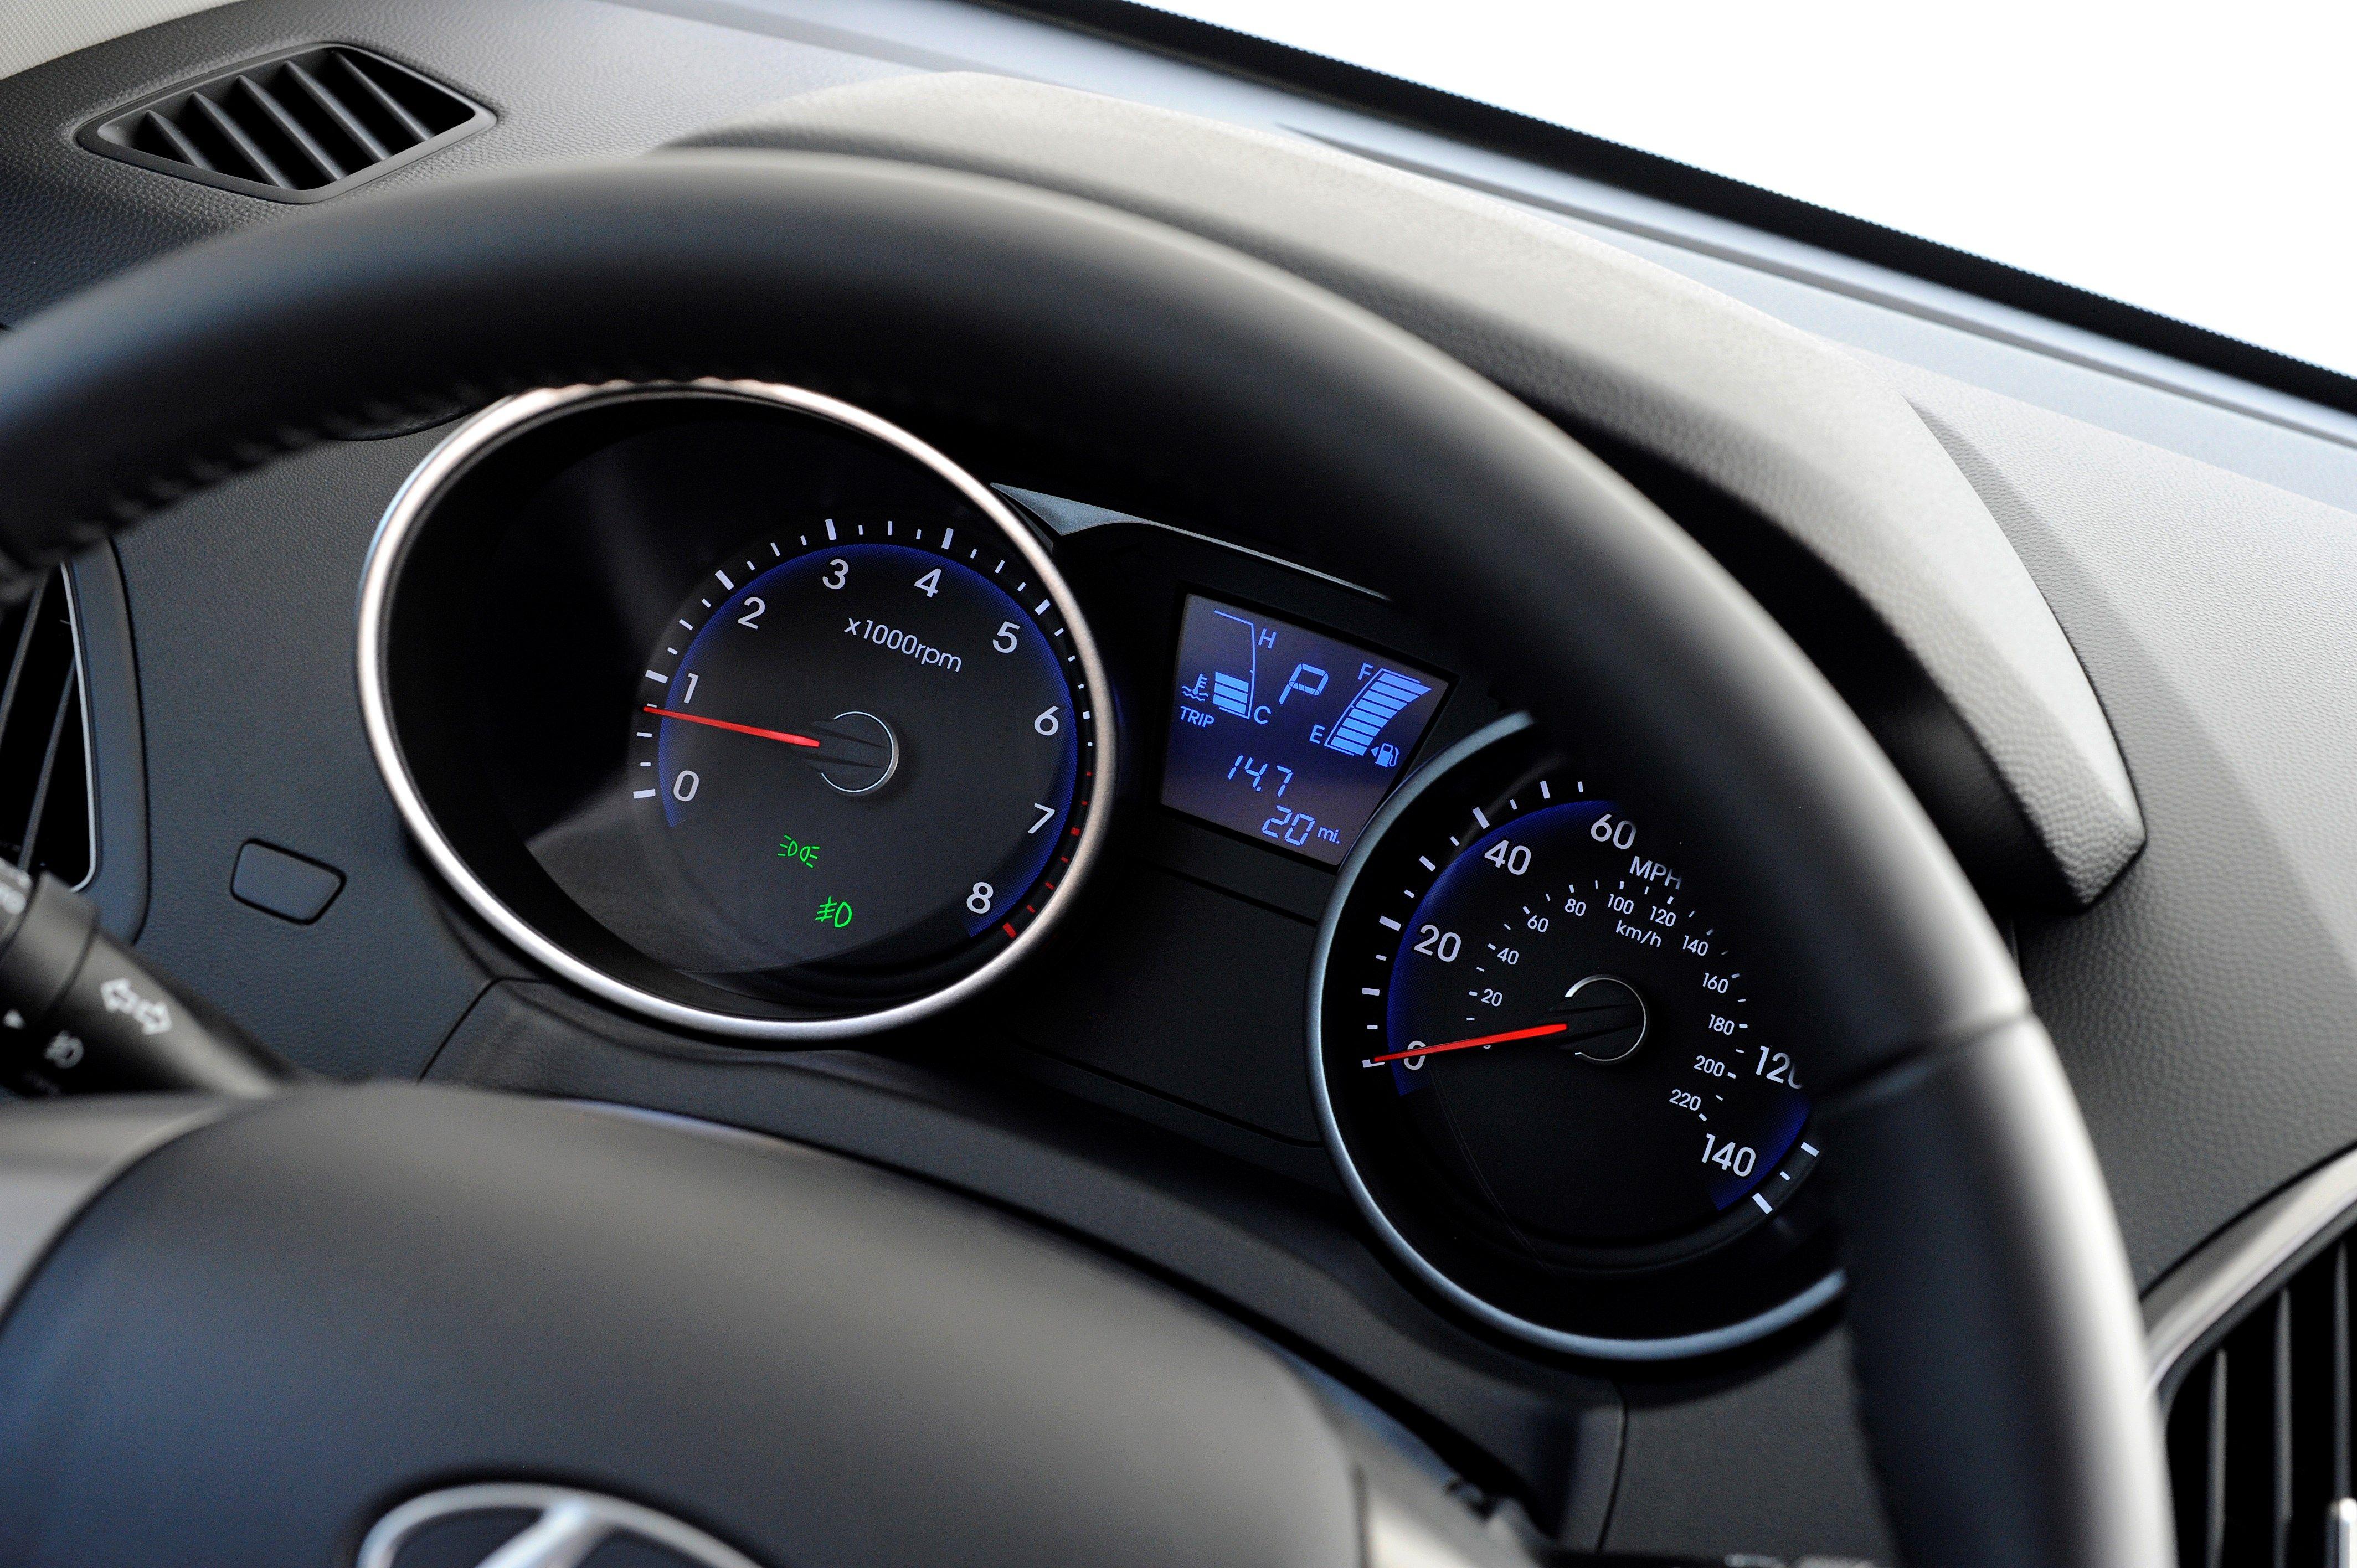 2014 hyundai tucson driver seat instrument display